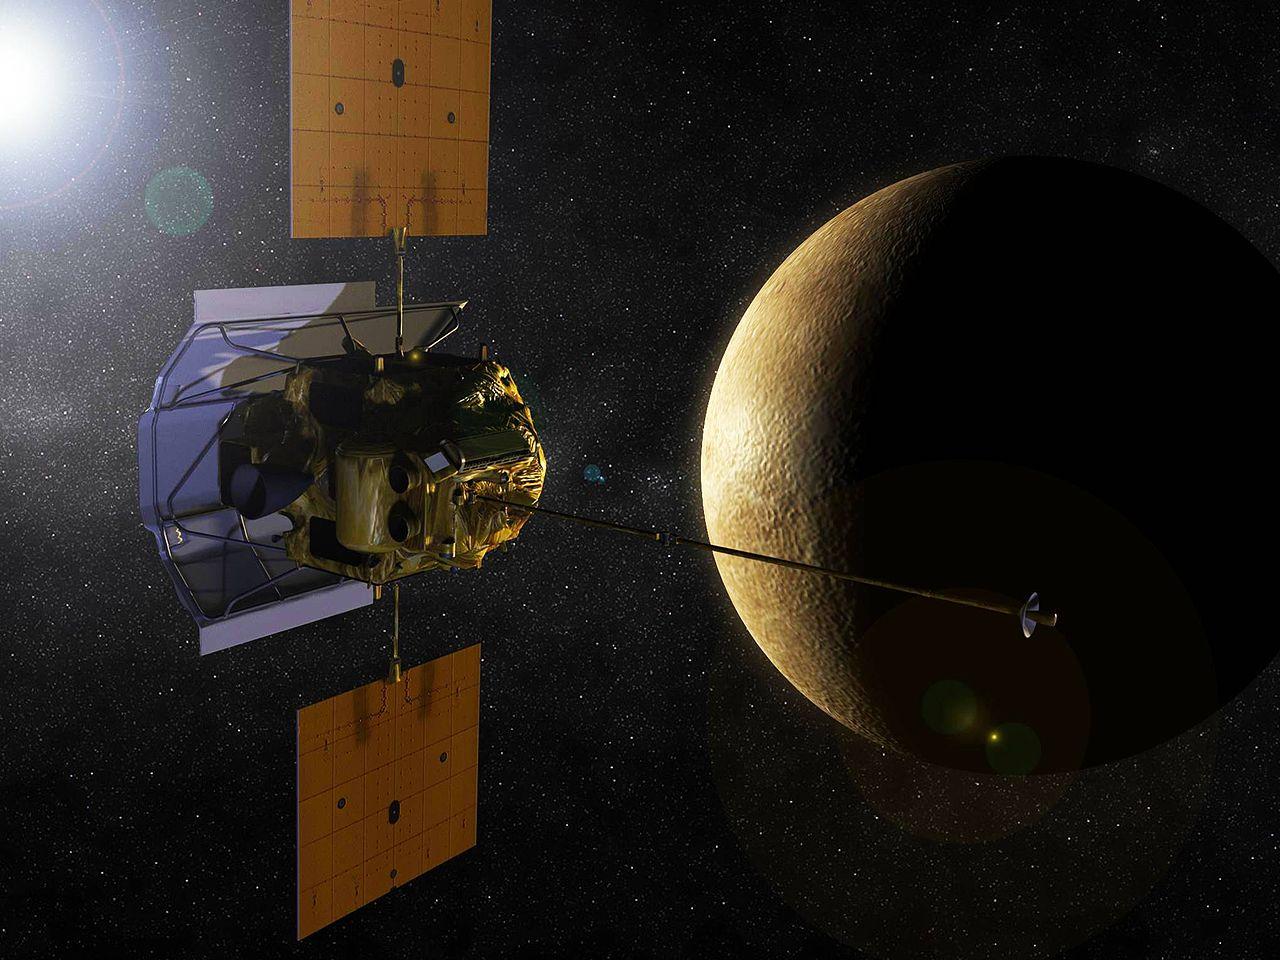 Representación artística de la sonda MESSENGER en órbita de Mercurio. Crédito: NASA